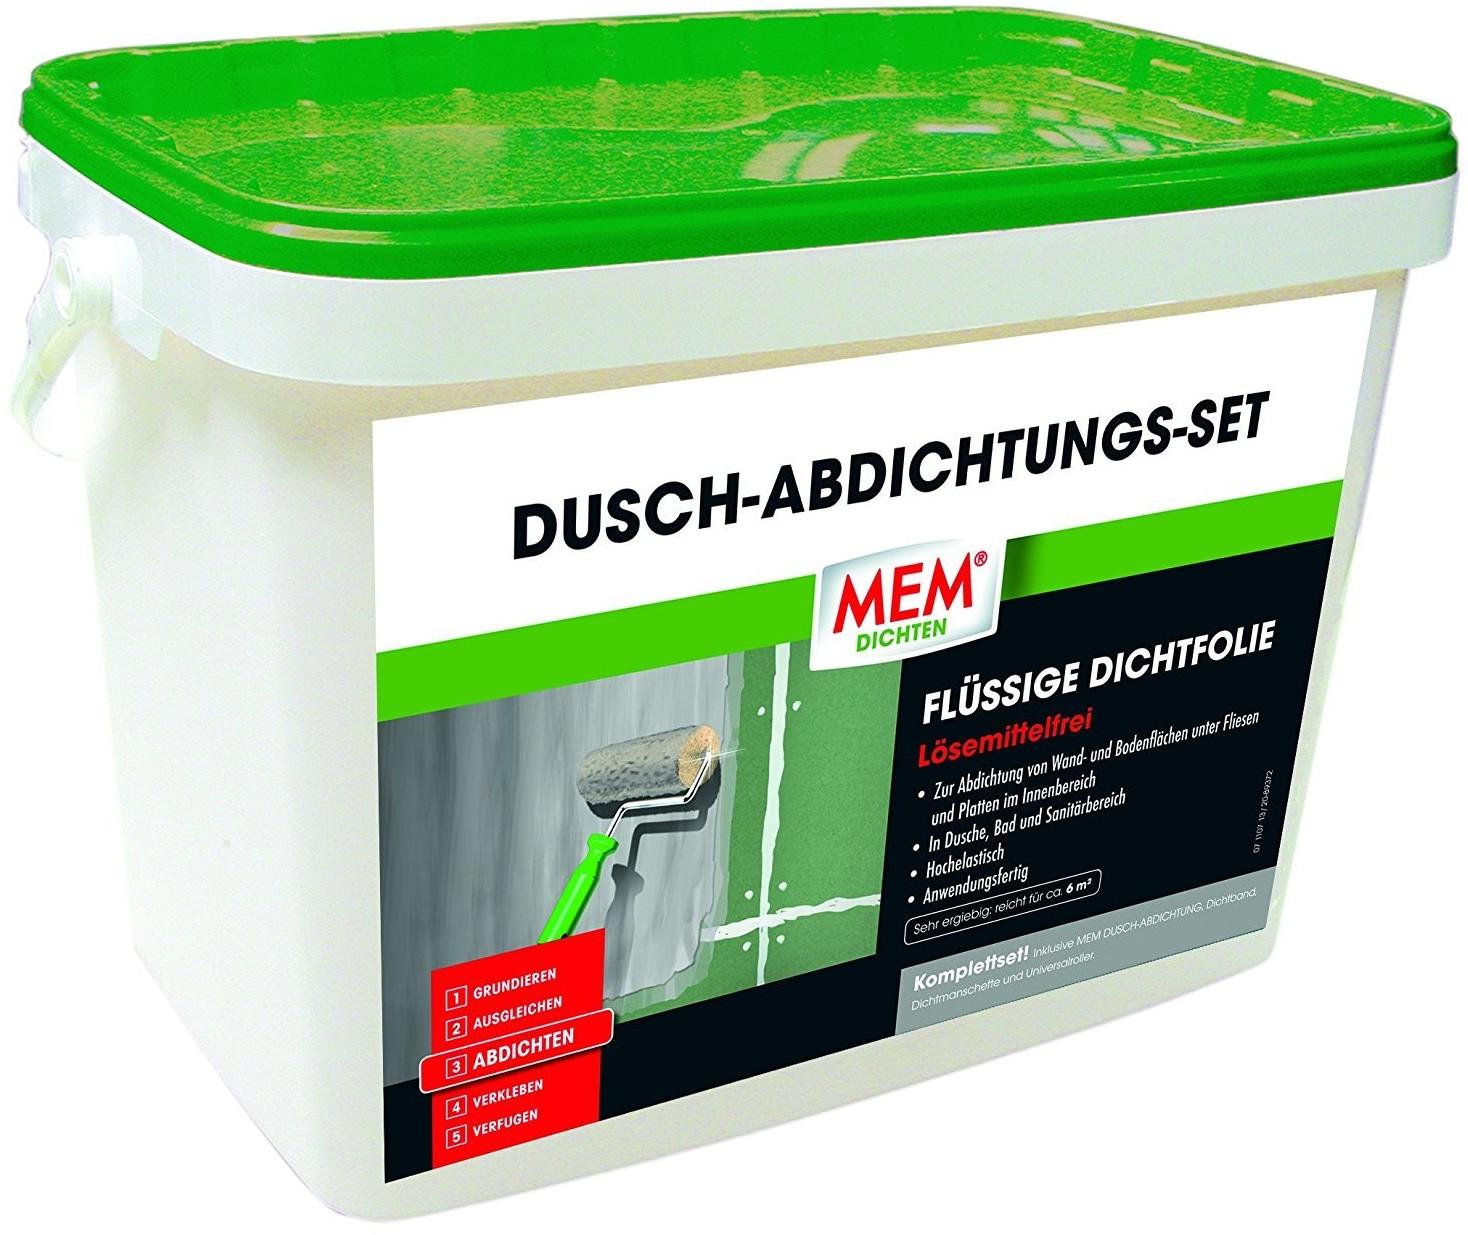 MEM Dusch-Abdichtungs-Set 8kg